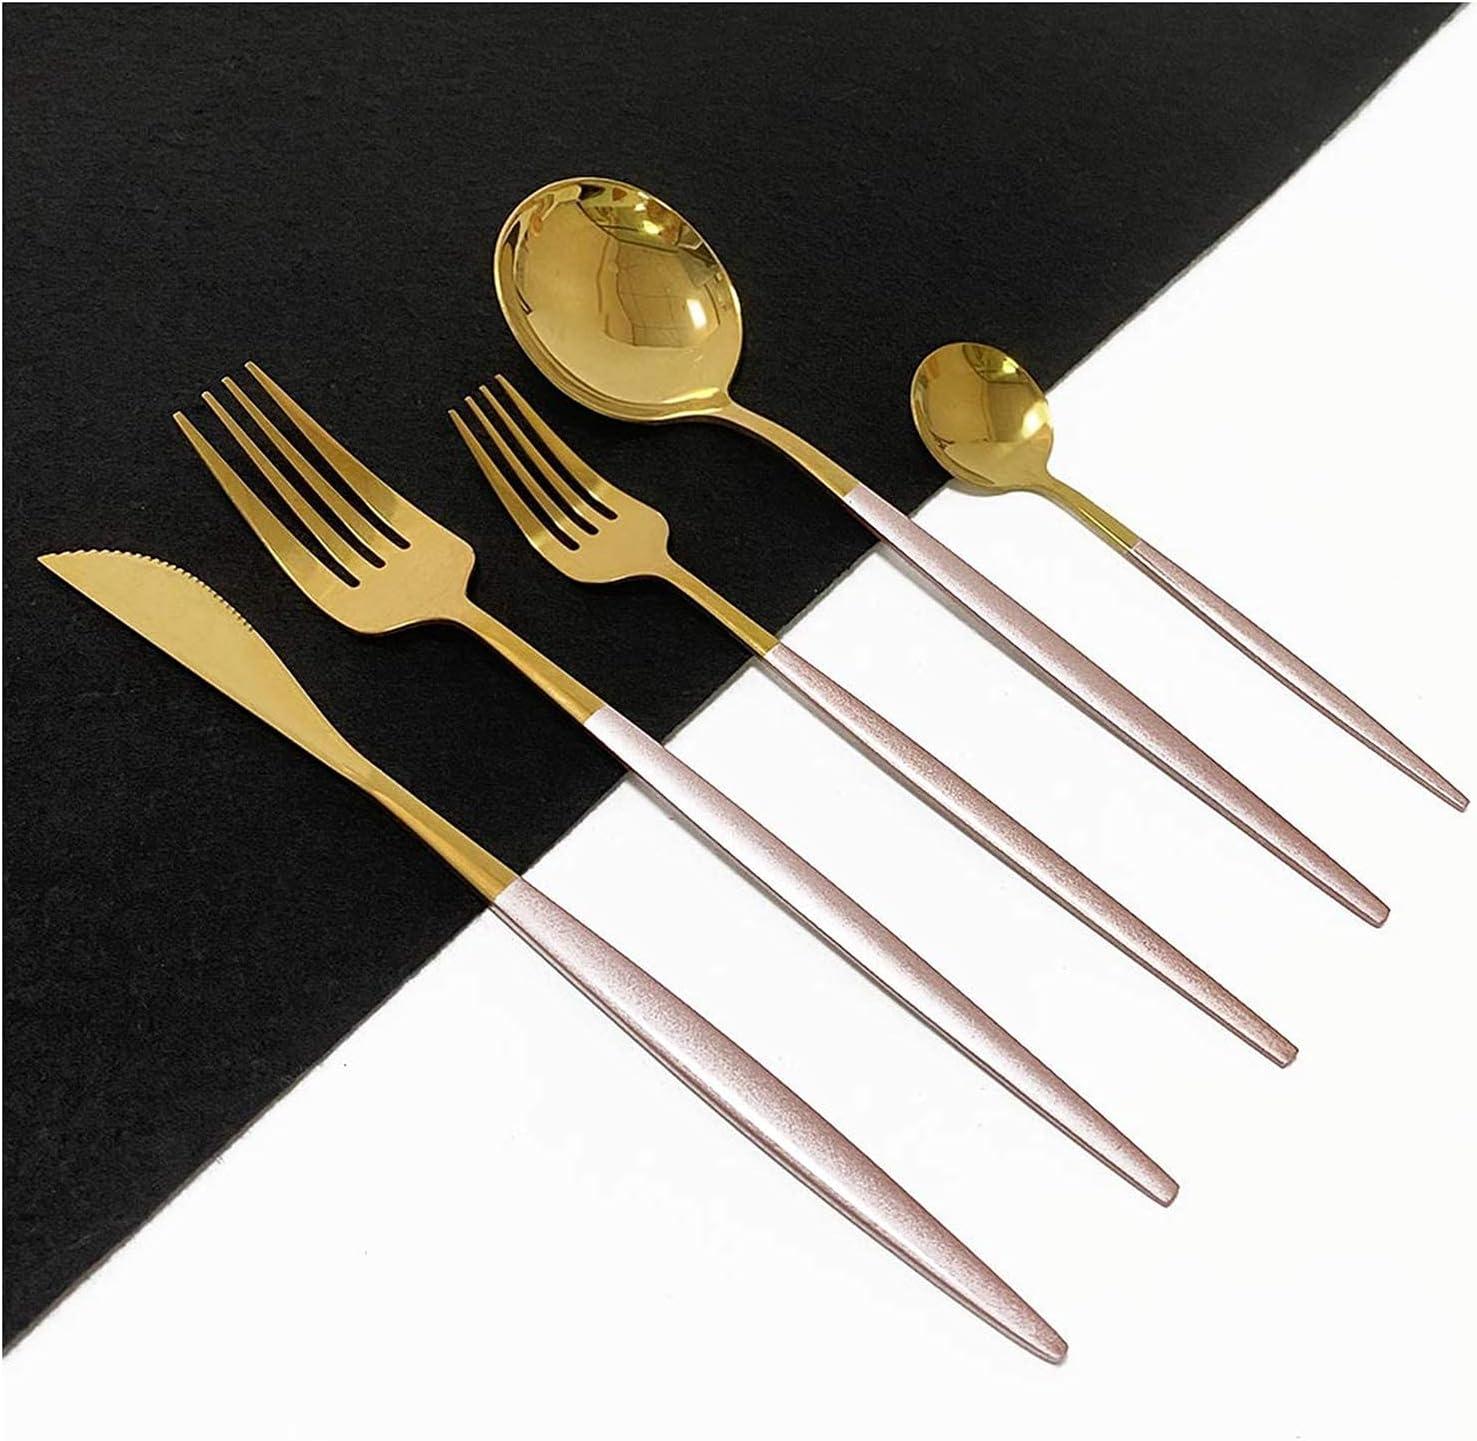 Silverware Set Reusable quality assurance 20-Piece specialty shop Gift